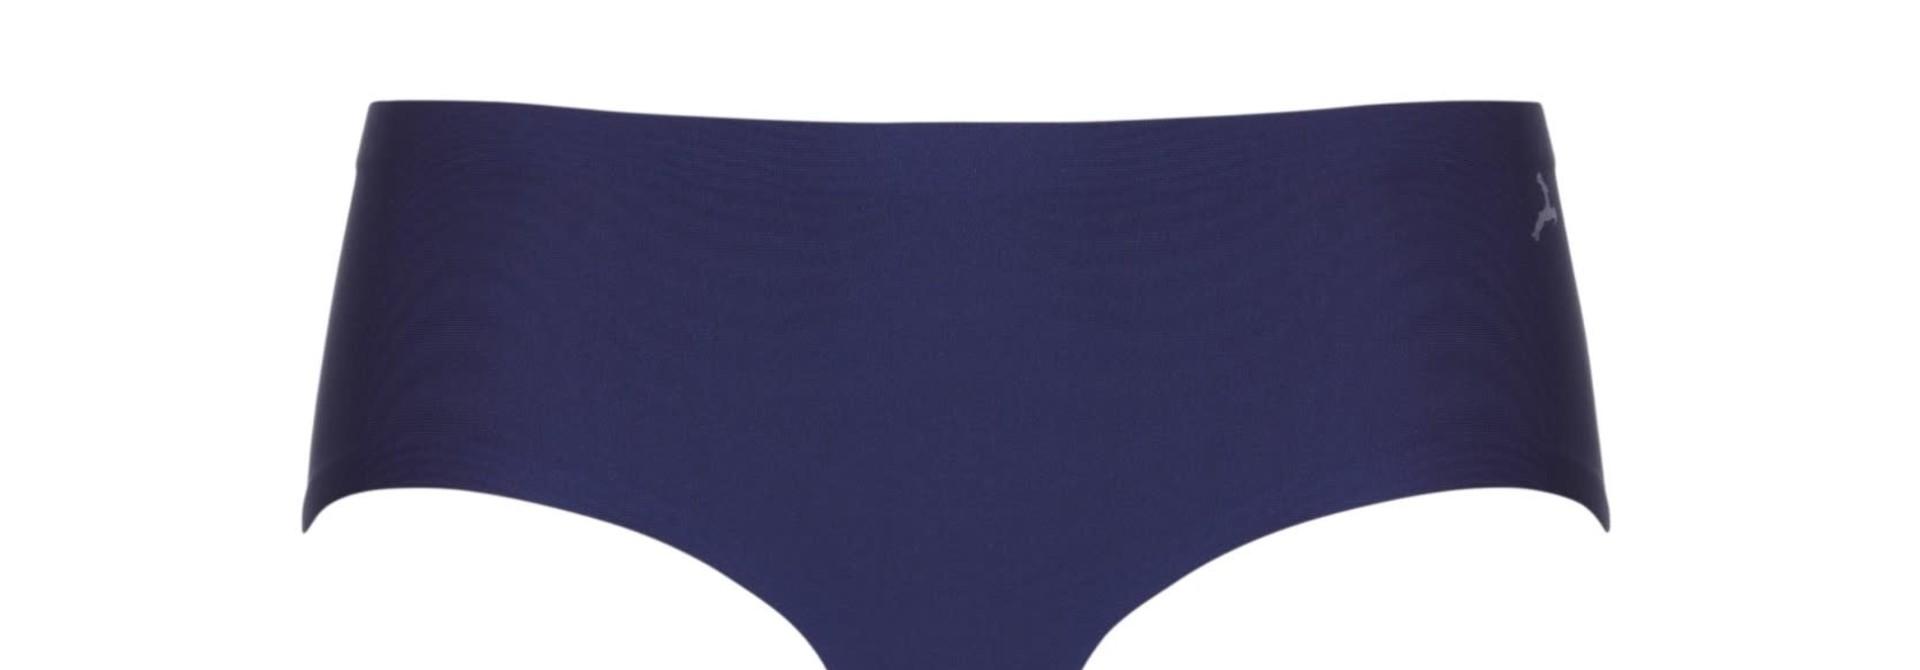 Hipster Secrets 30175 - blauw